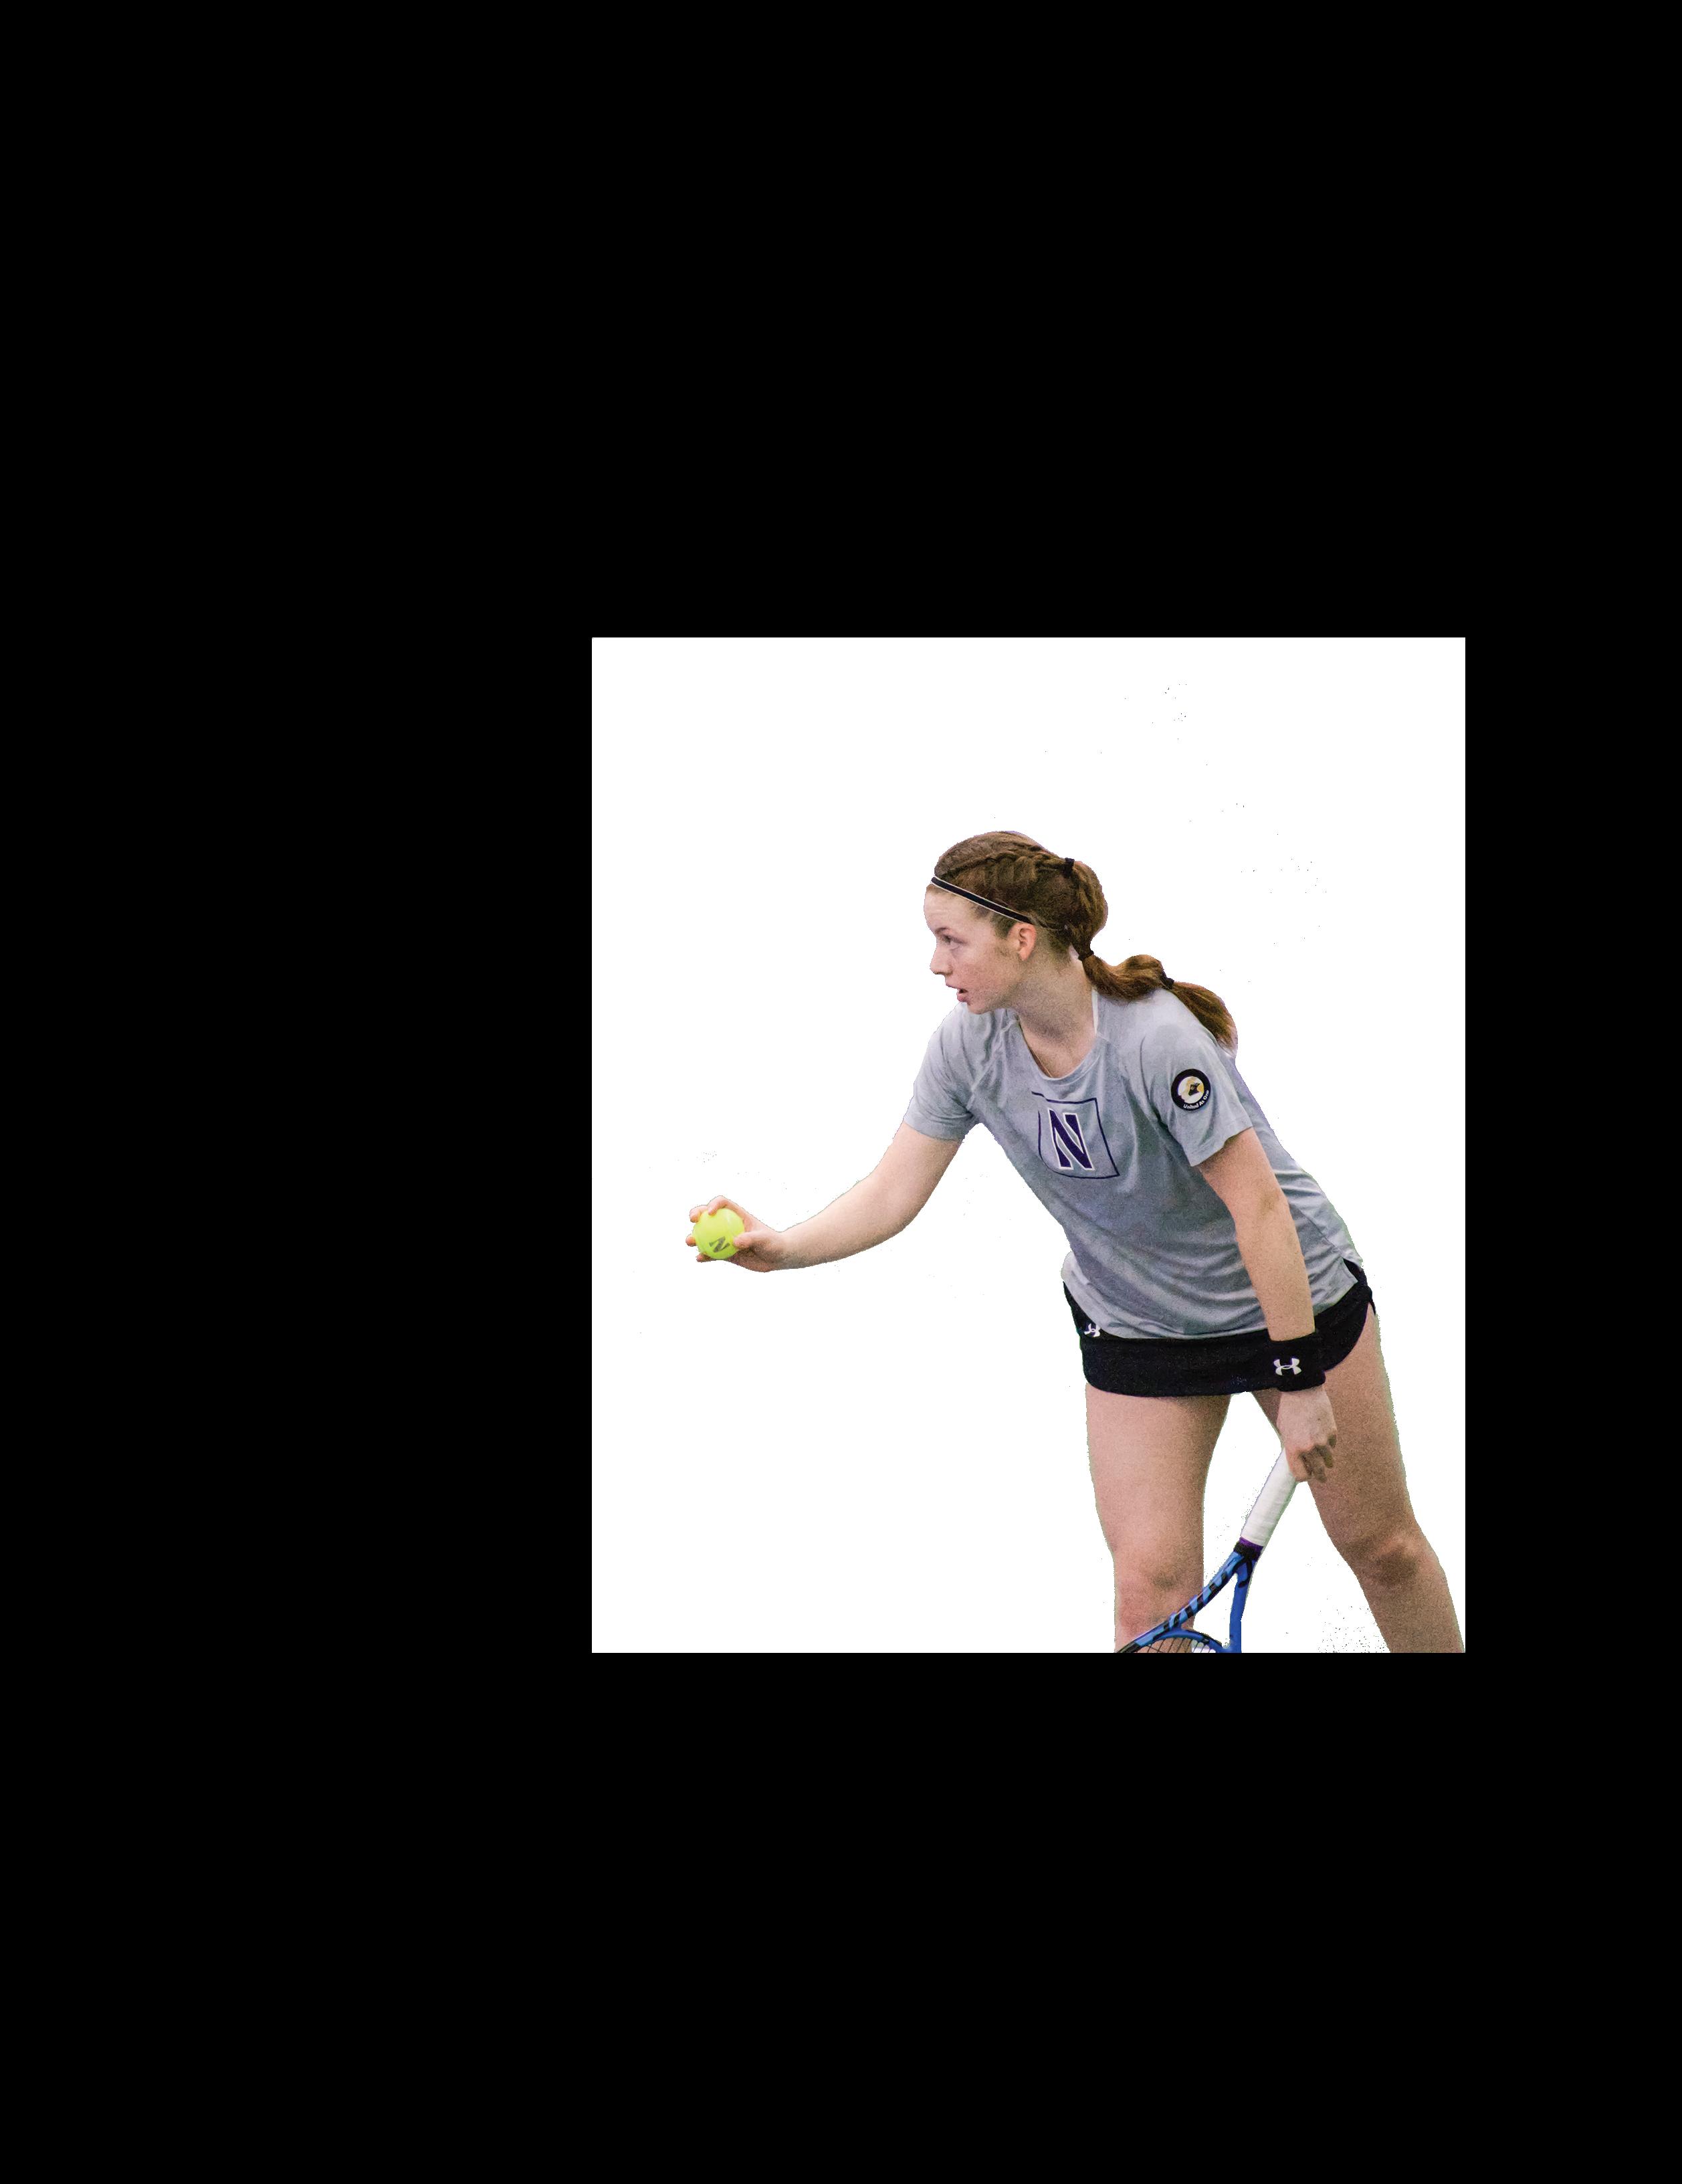 tennis-girl-serving